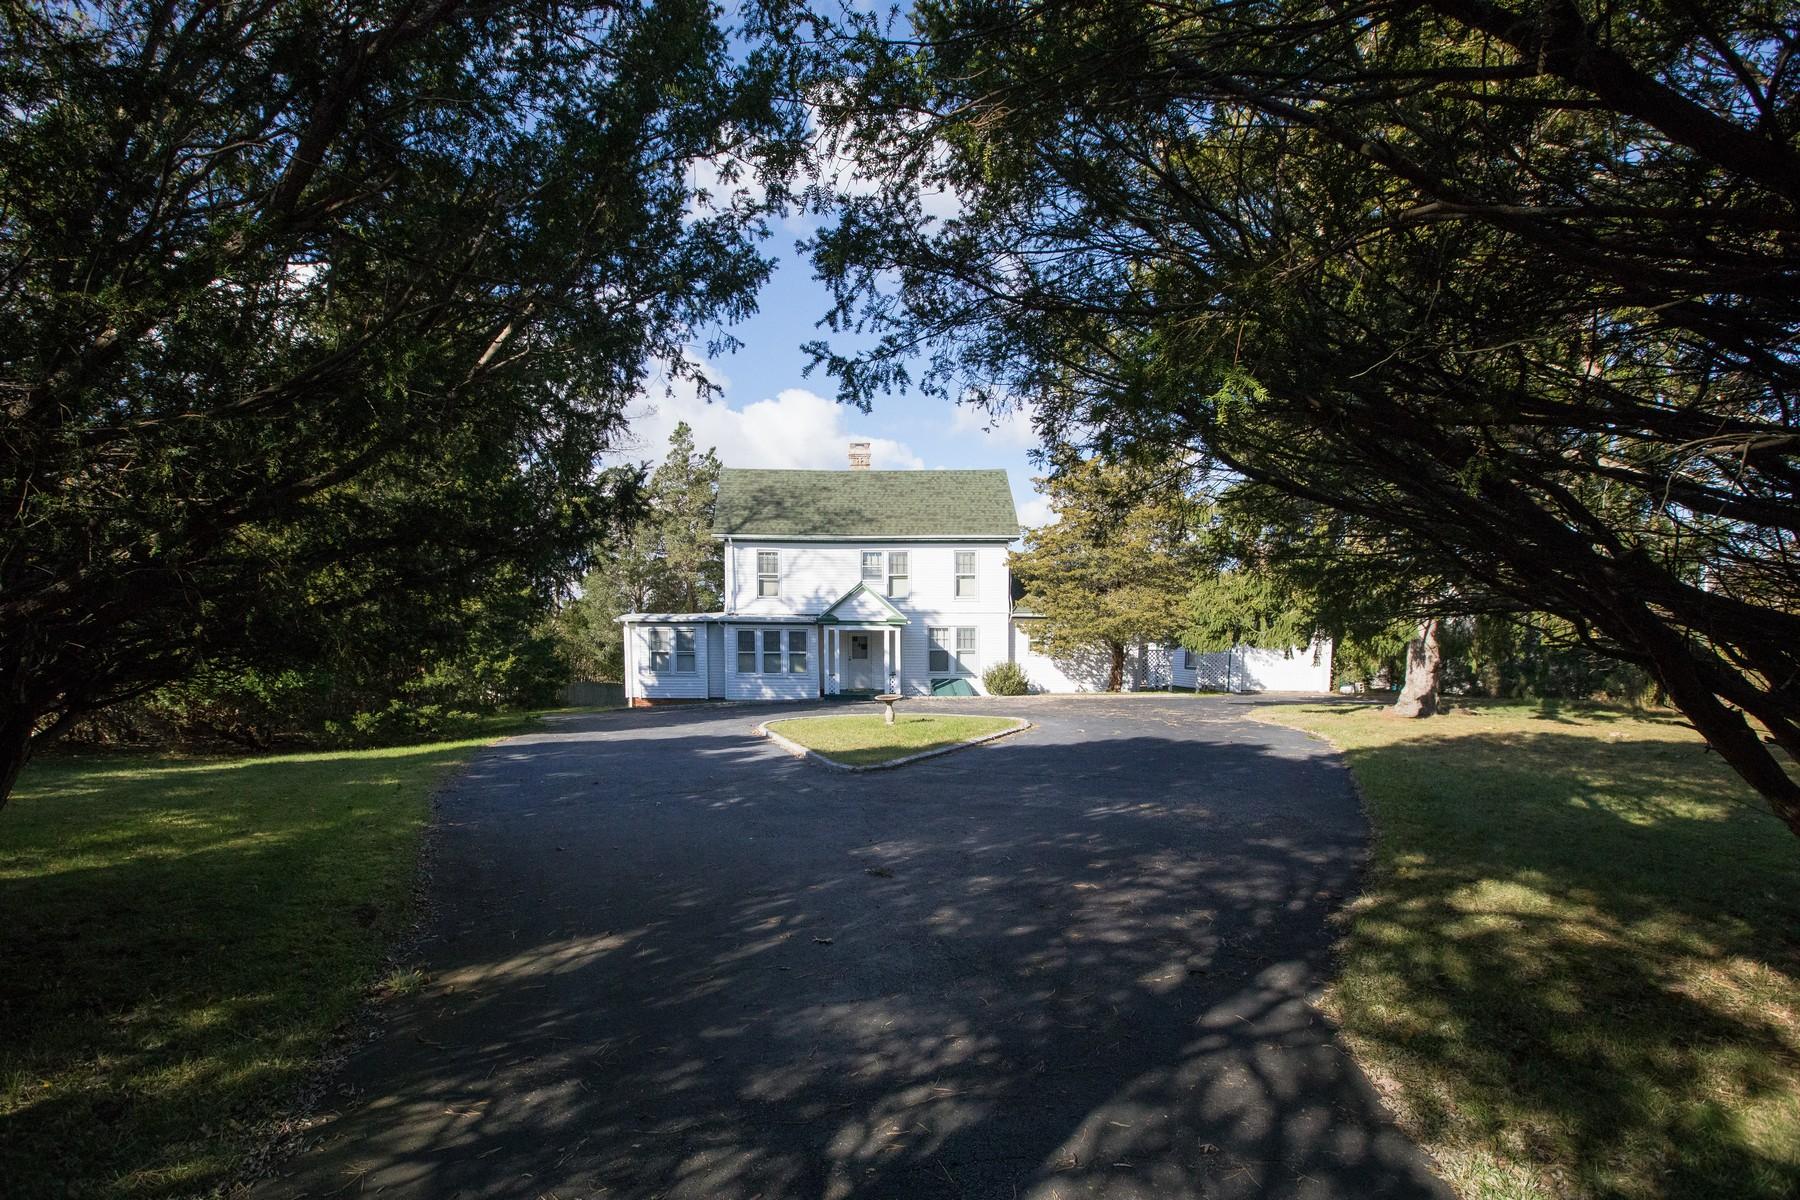 Single Family Homes for Active at Hampton Bays 28 Rampasture Rd Hampton Bays, New York 11946 United States